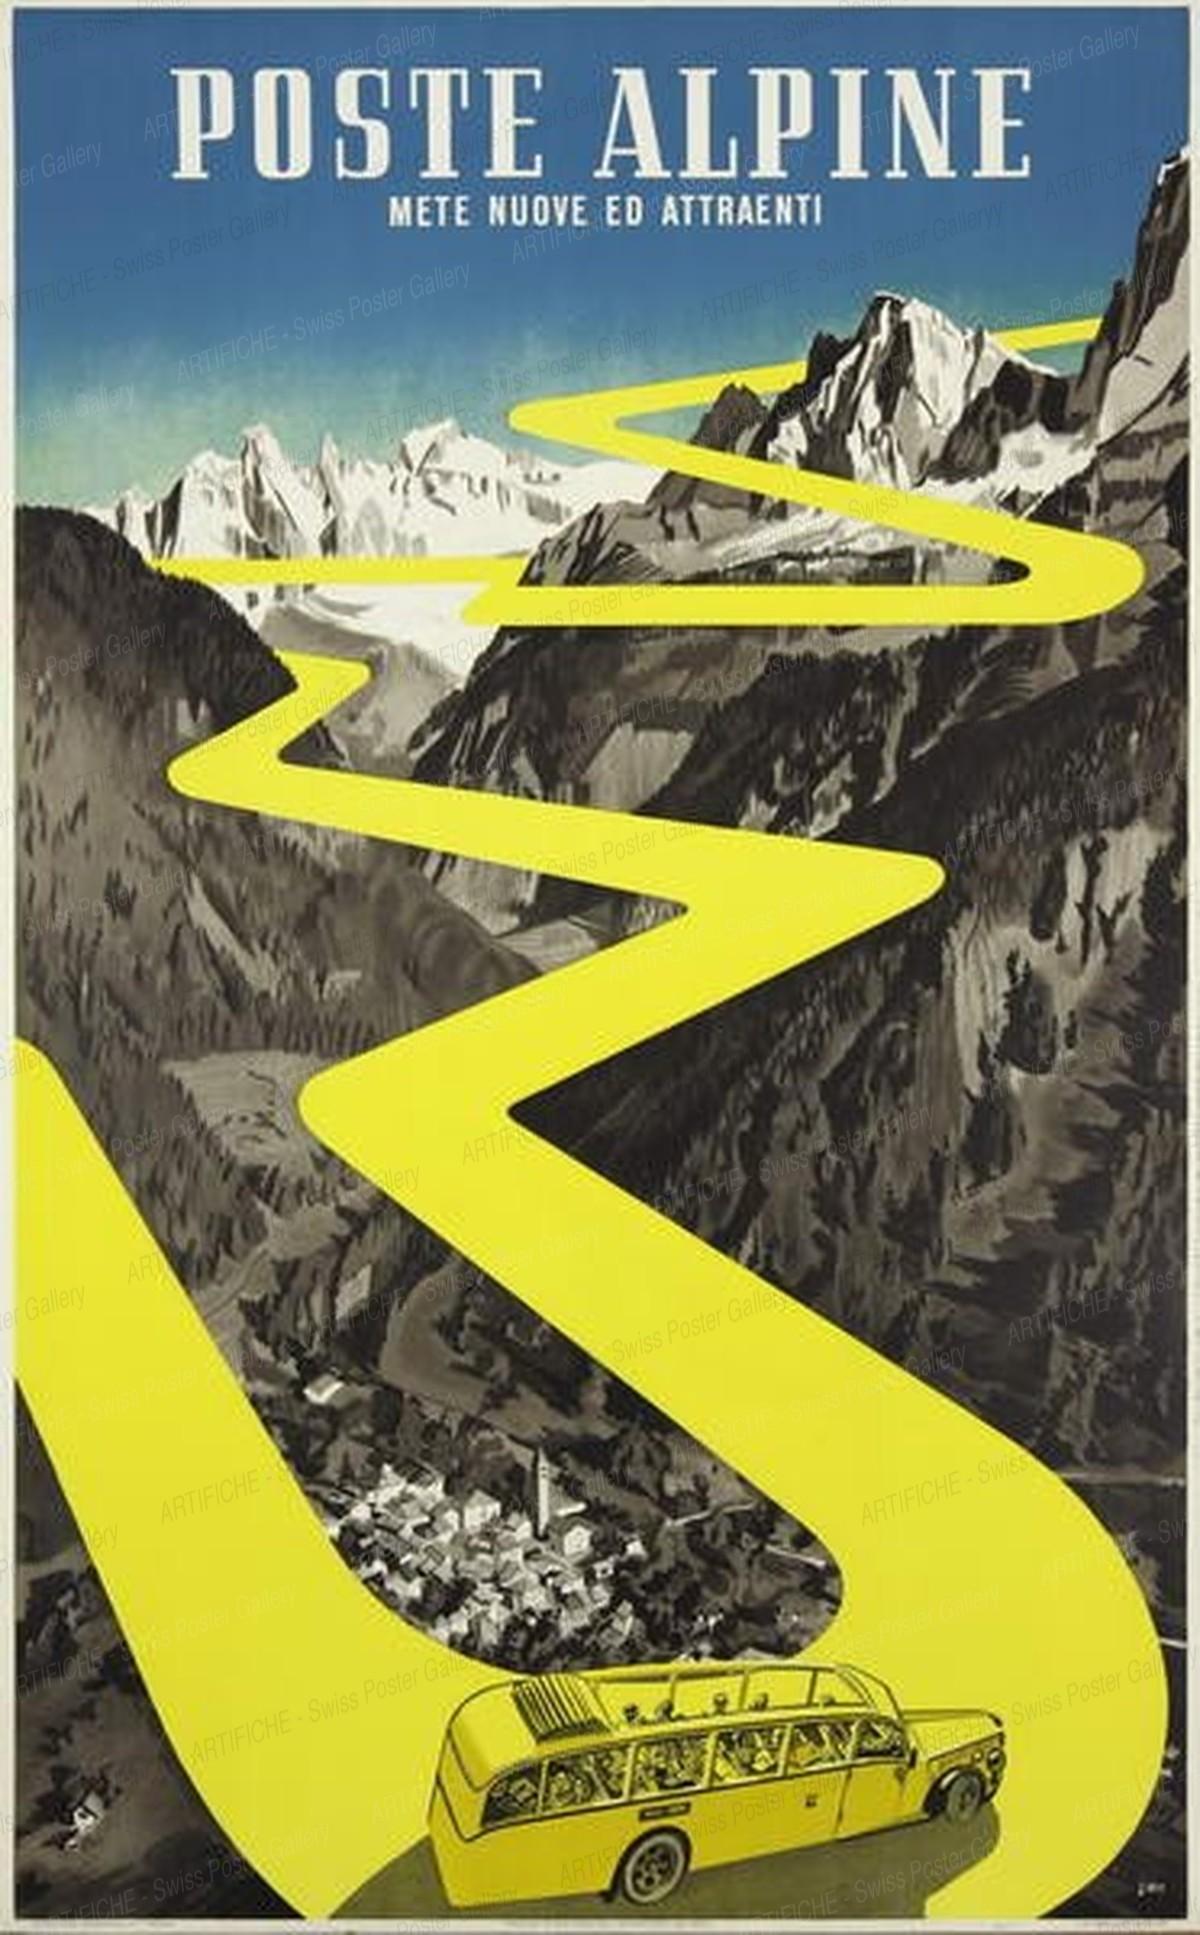 Swiss Alpine Postal Coaches, Herbert Berthold Libiszewski